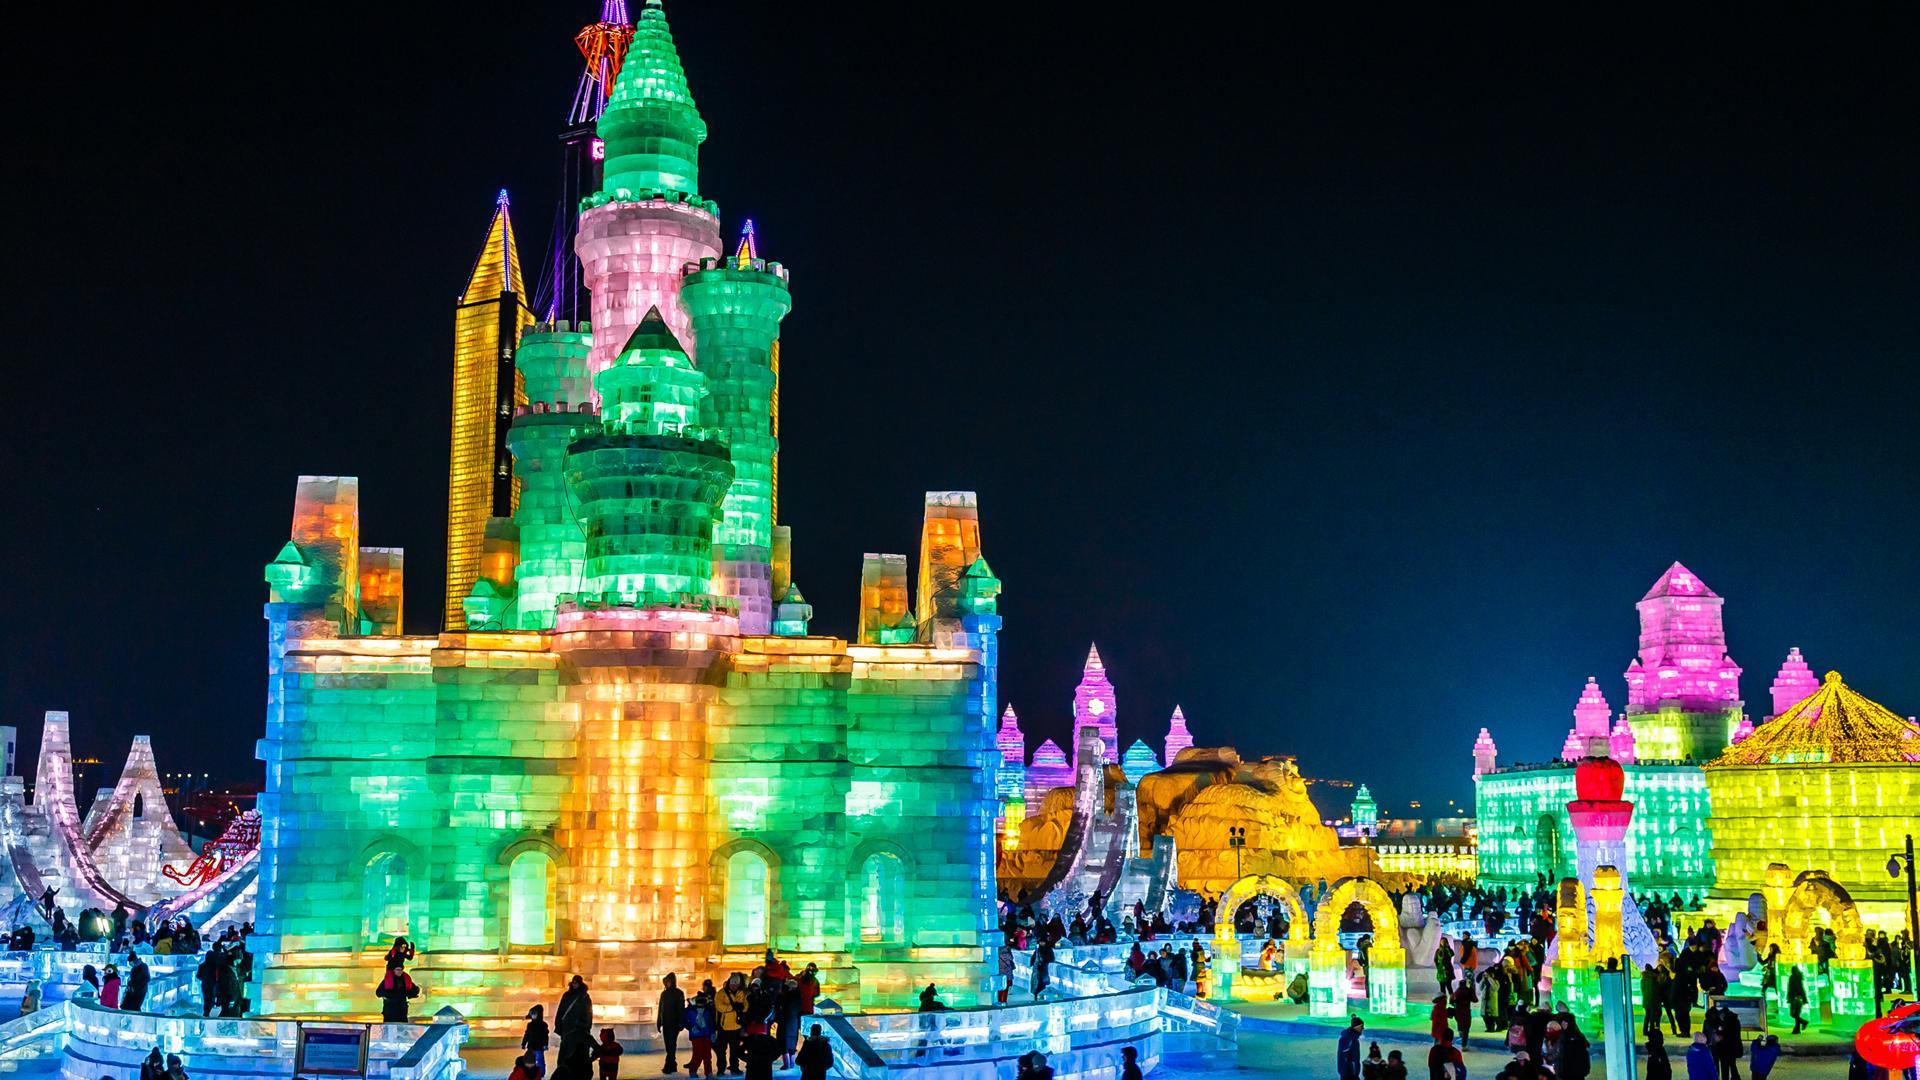 Ice sculpture festival, Harbin, China